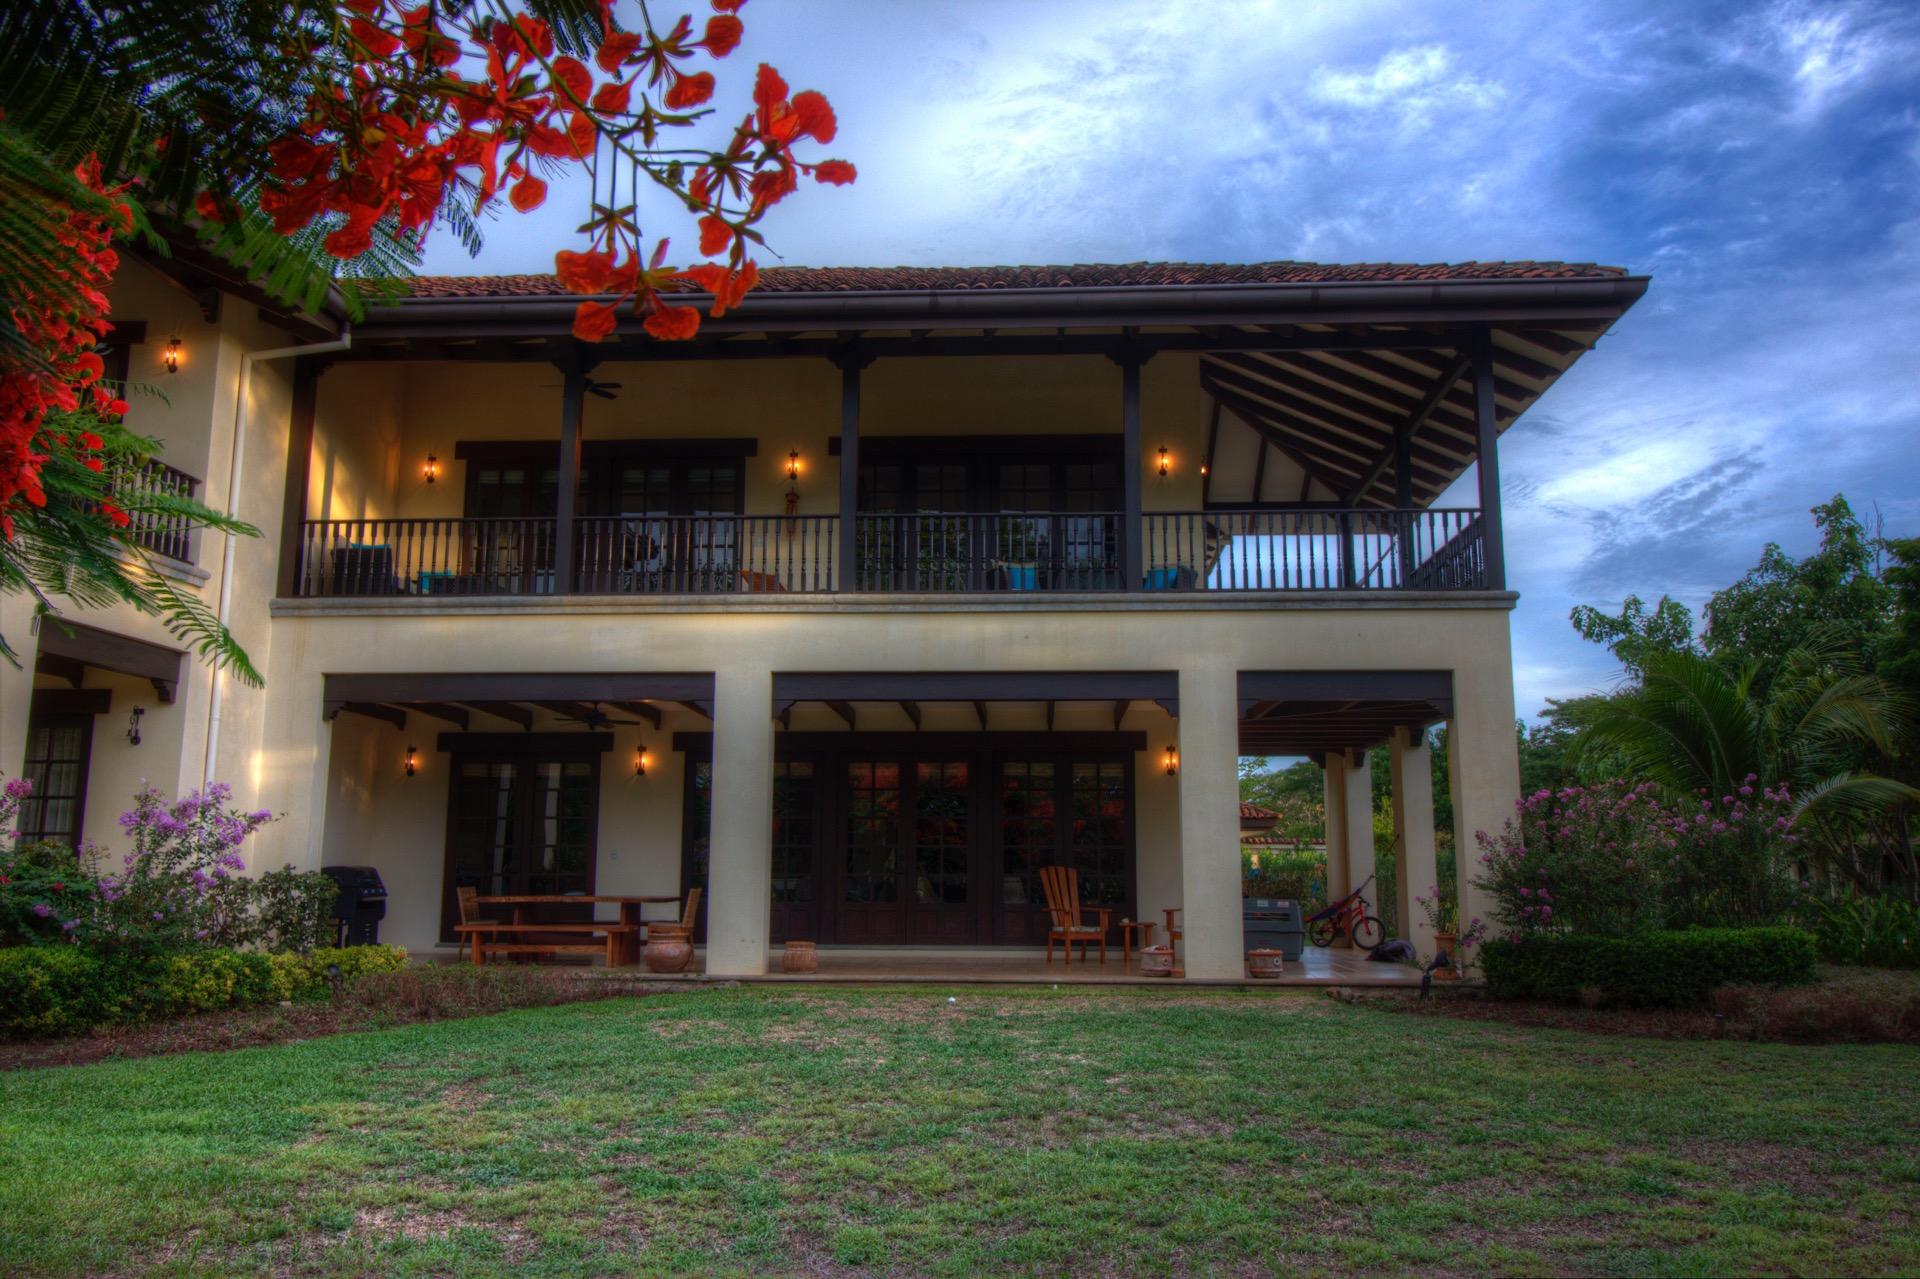 2-story Villa next to the beach